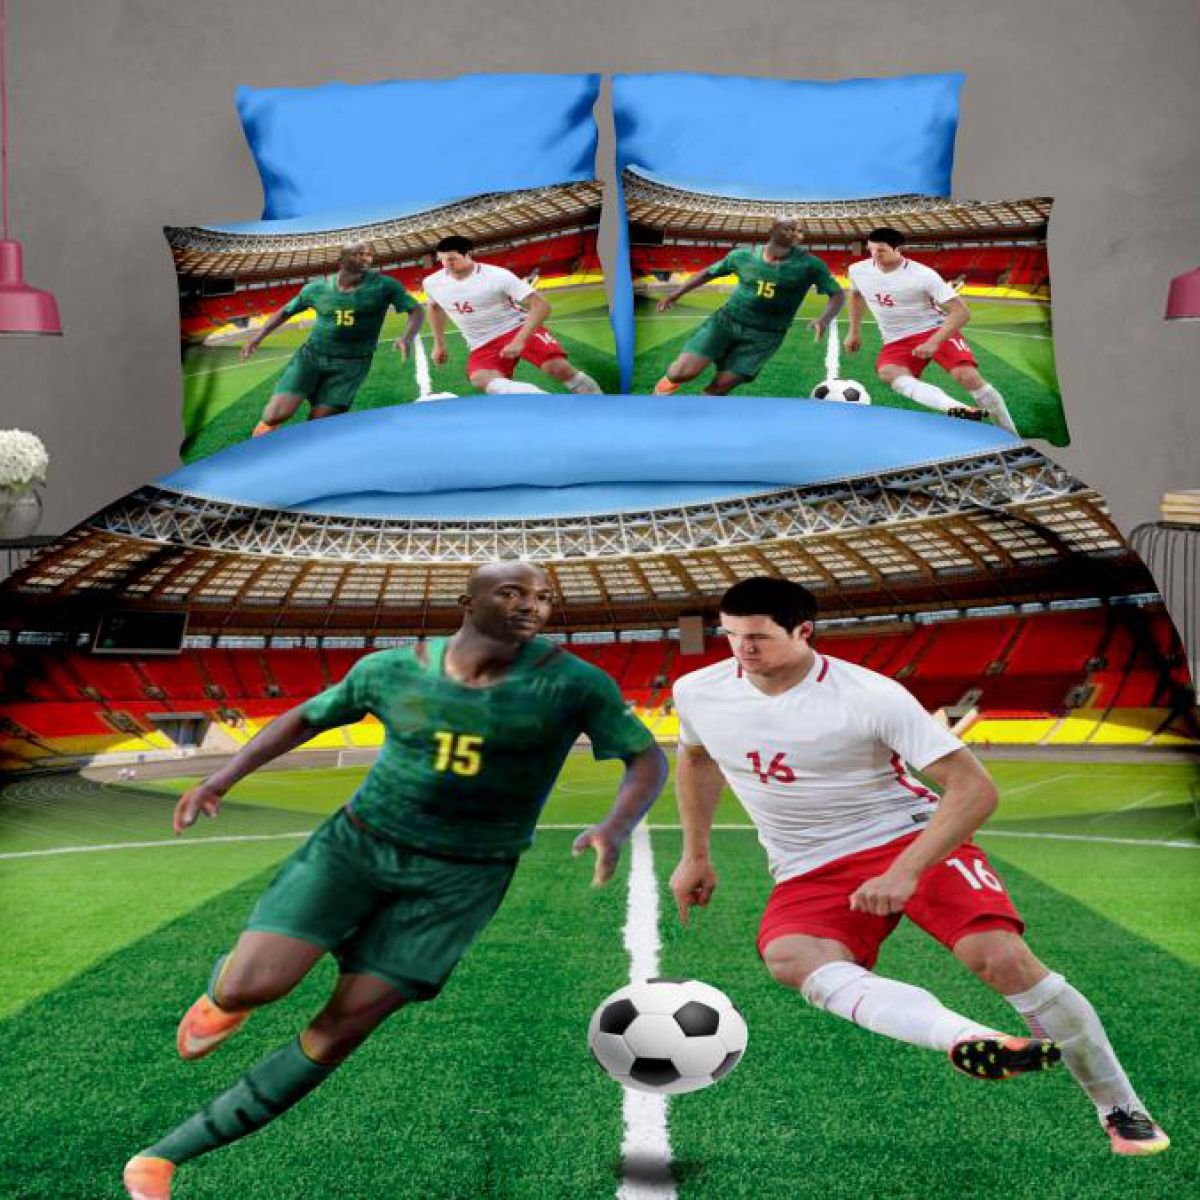 3D Beddings - Febe - Football - FPW-402-01 - 160x200 cm - 4 pcs